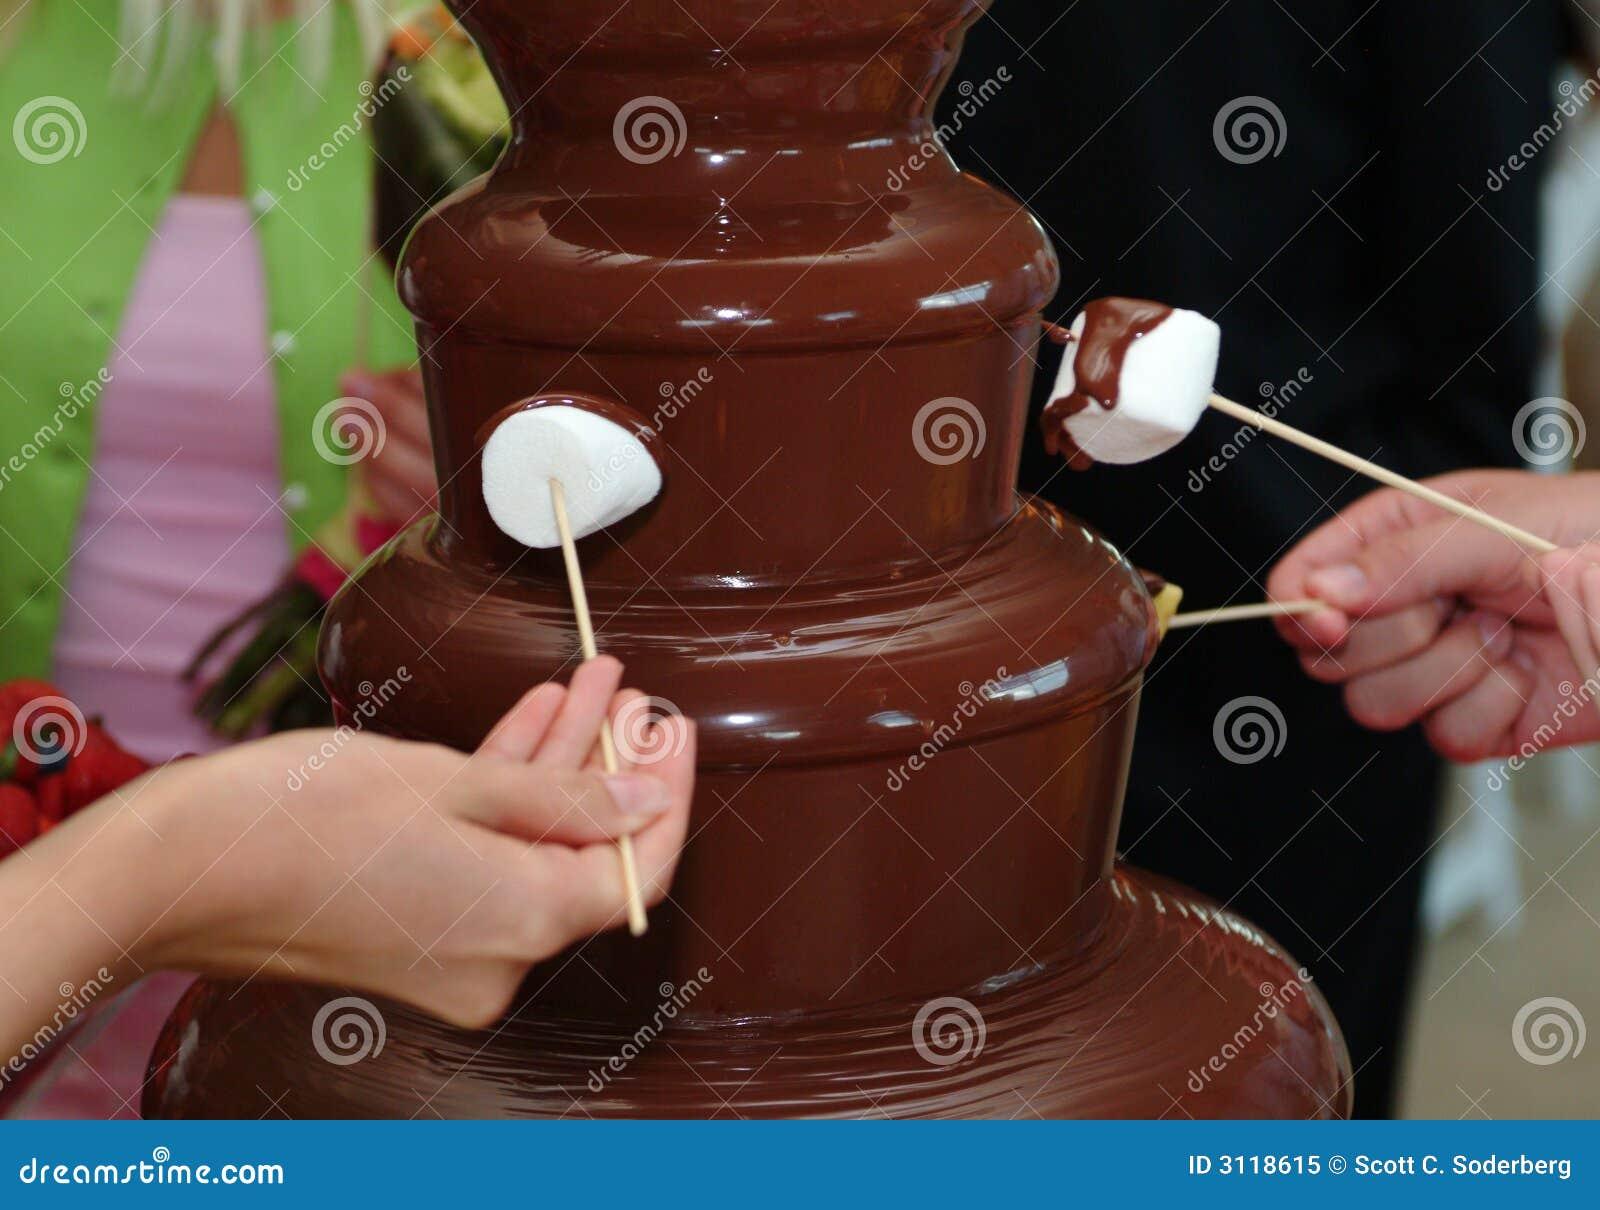 Chocolate Fondue Fountain Stock Image - Image: 5753111